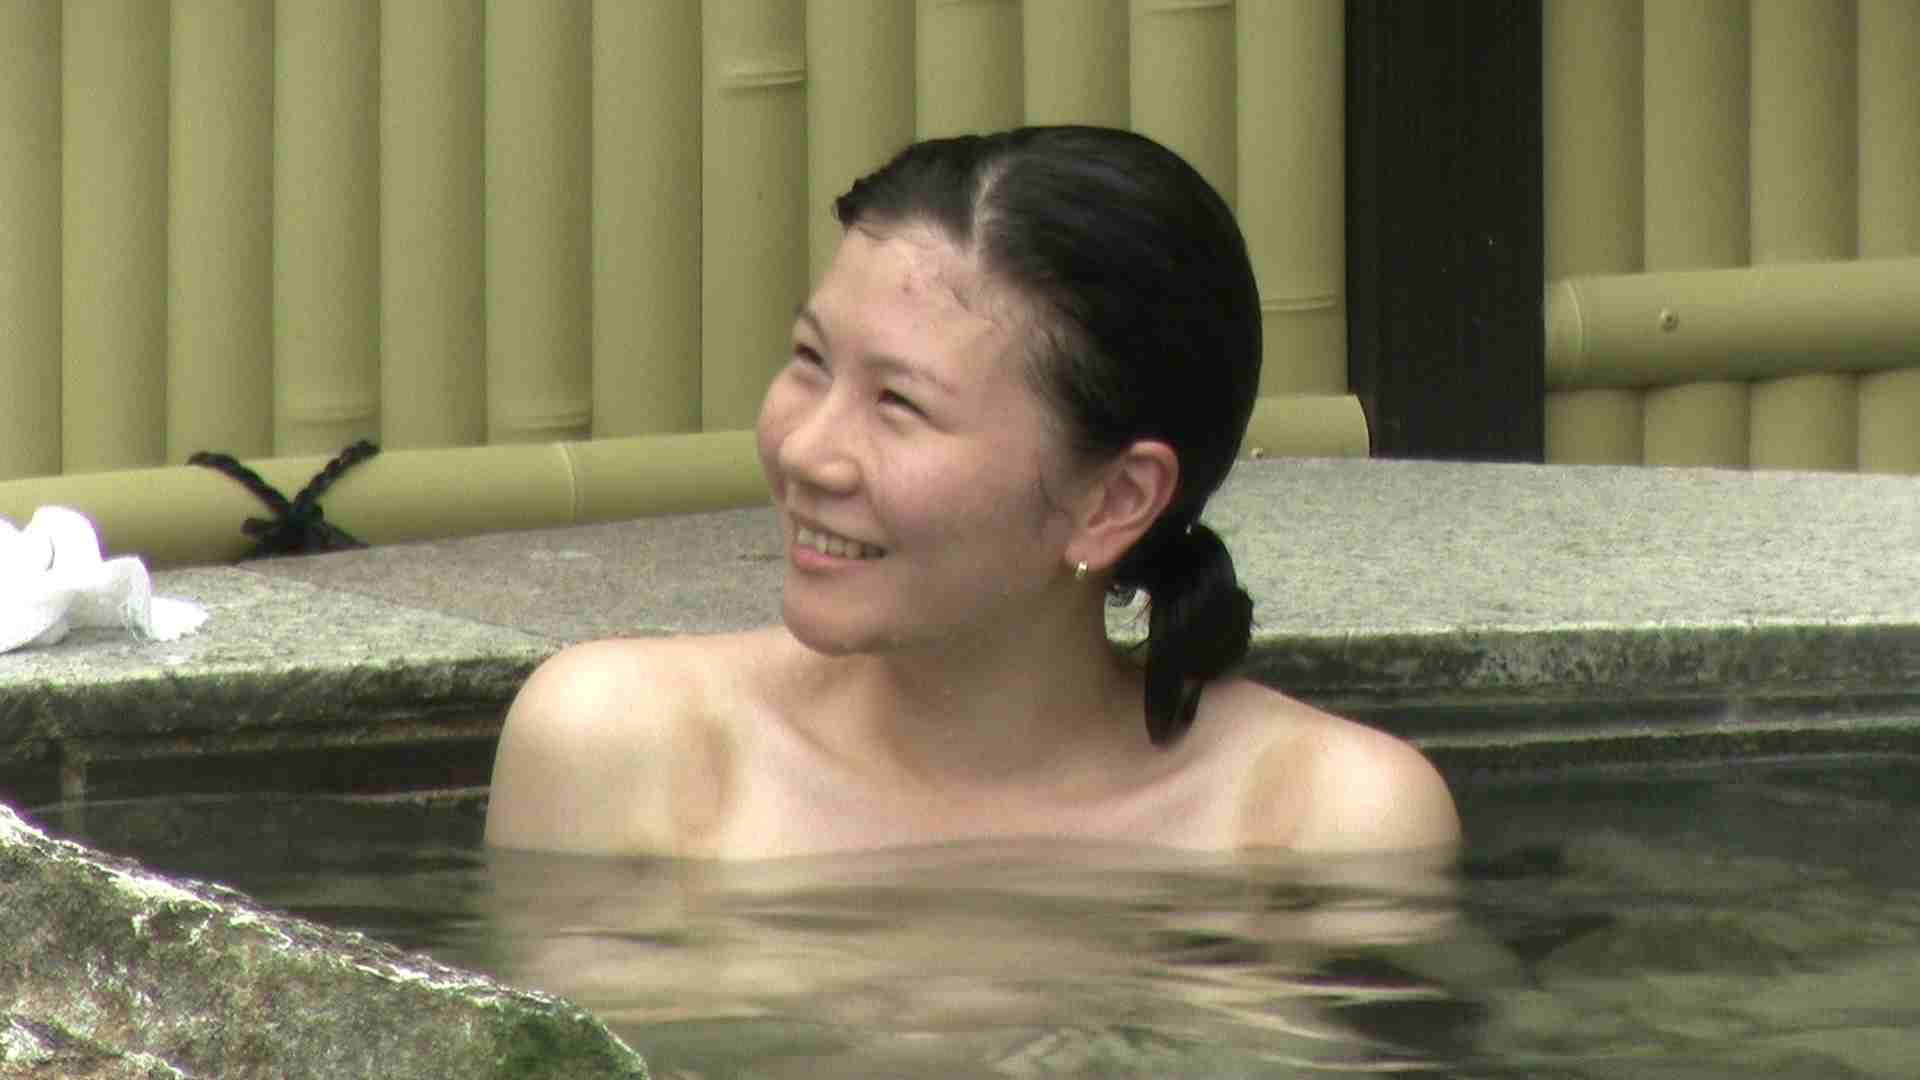 Aquaな露天風呂Vol.187 盗撮映像  99Pix 38